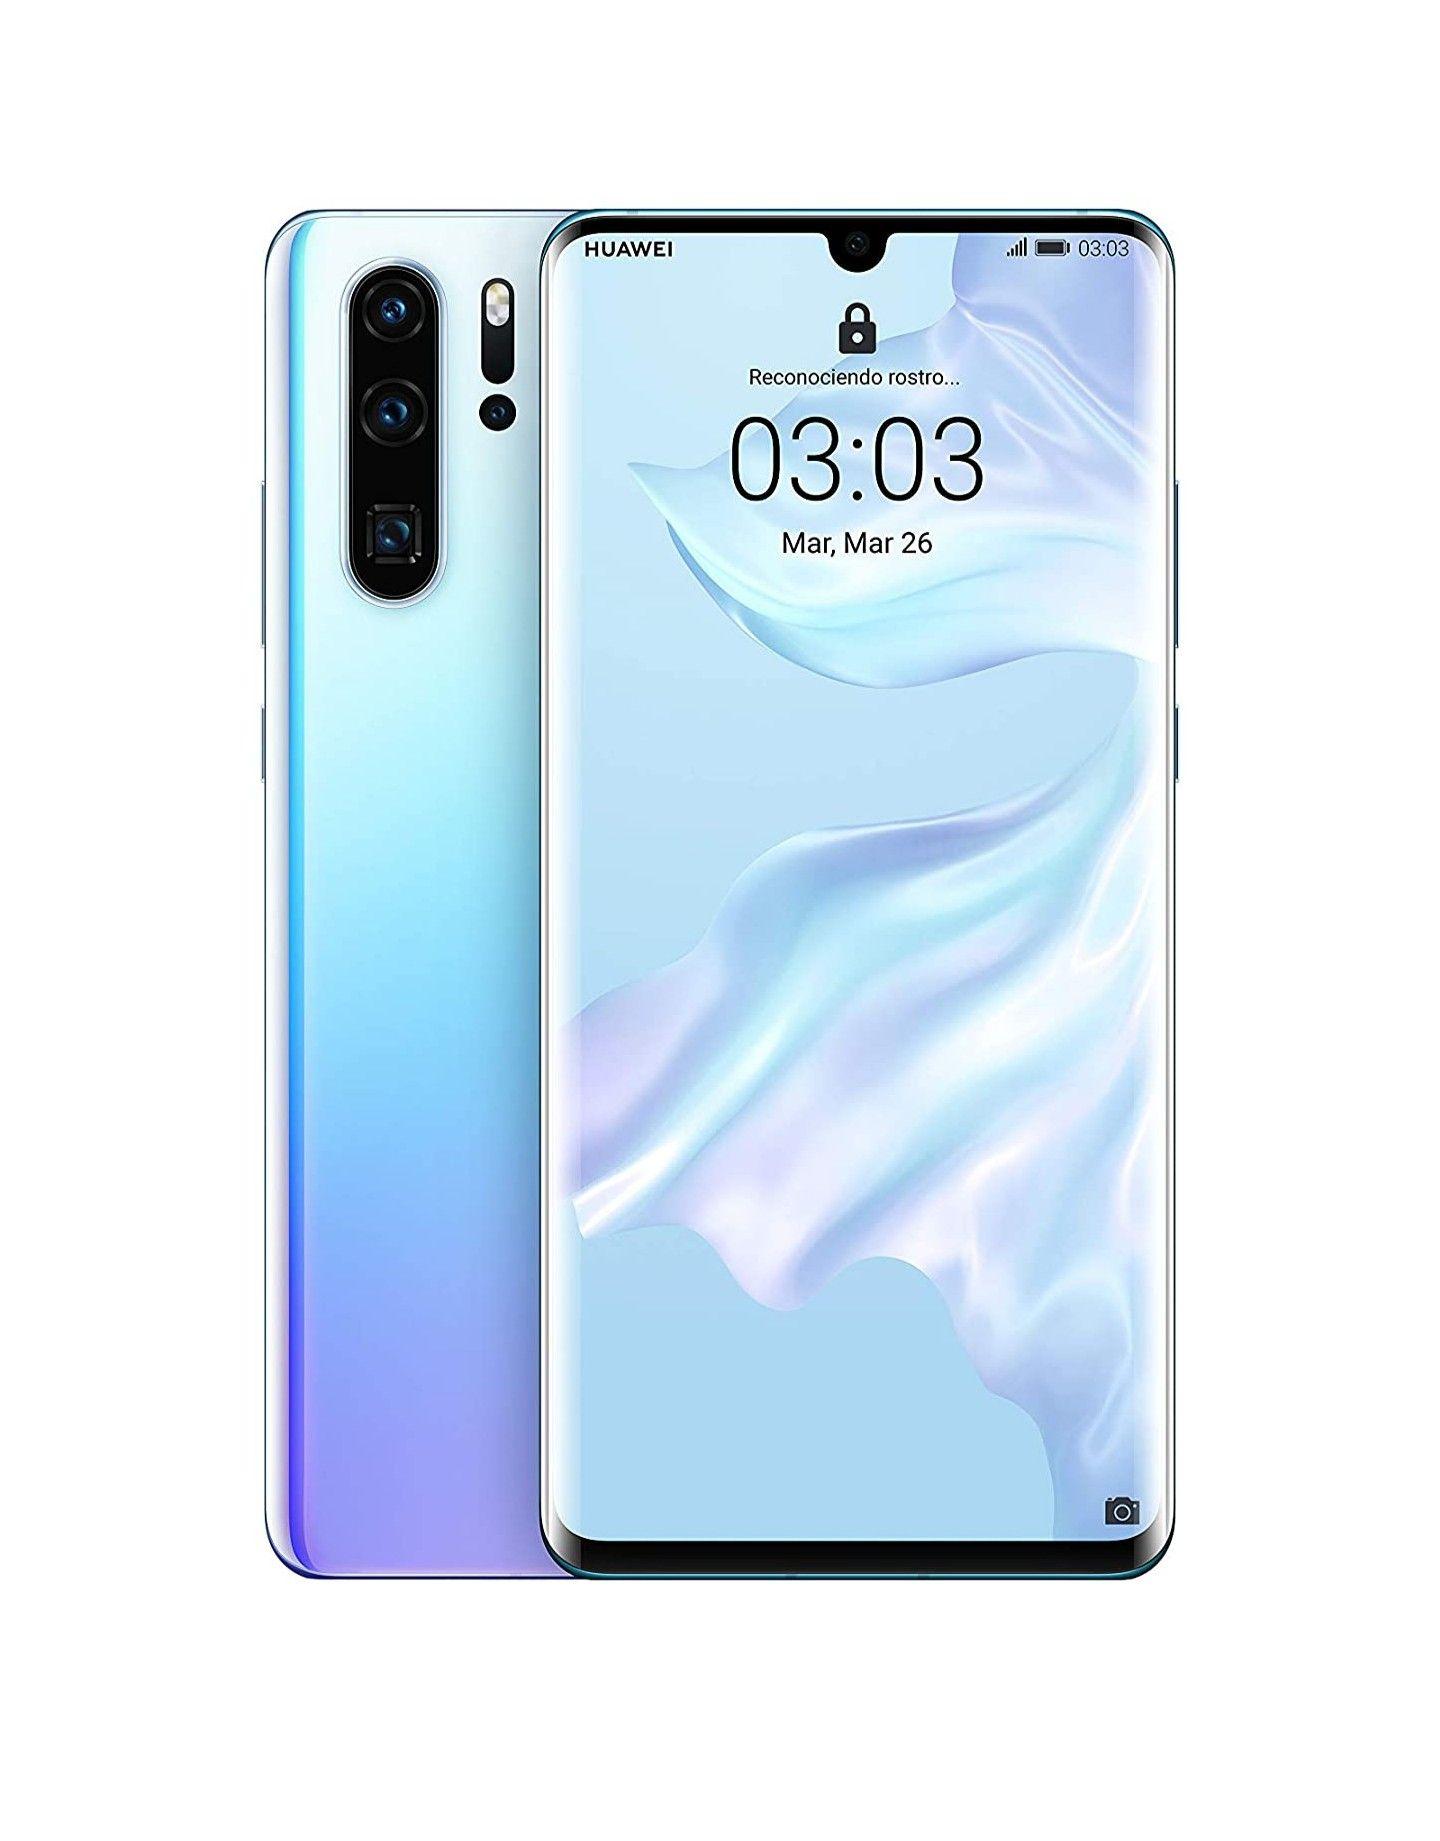 Huawei P30 Pro - 8/128GB